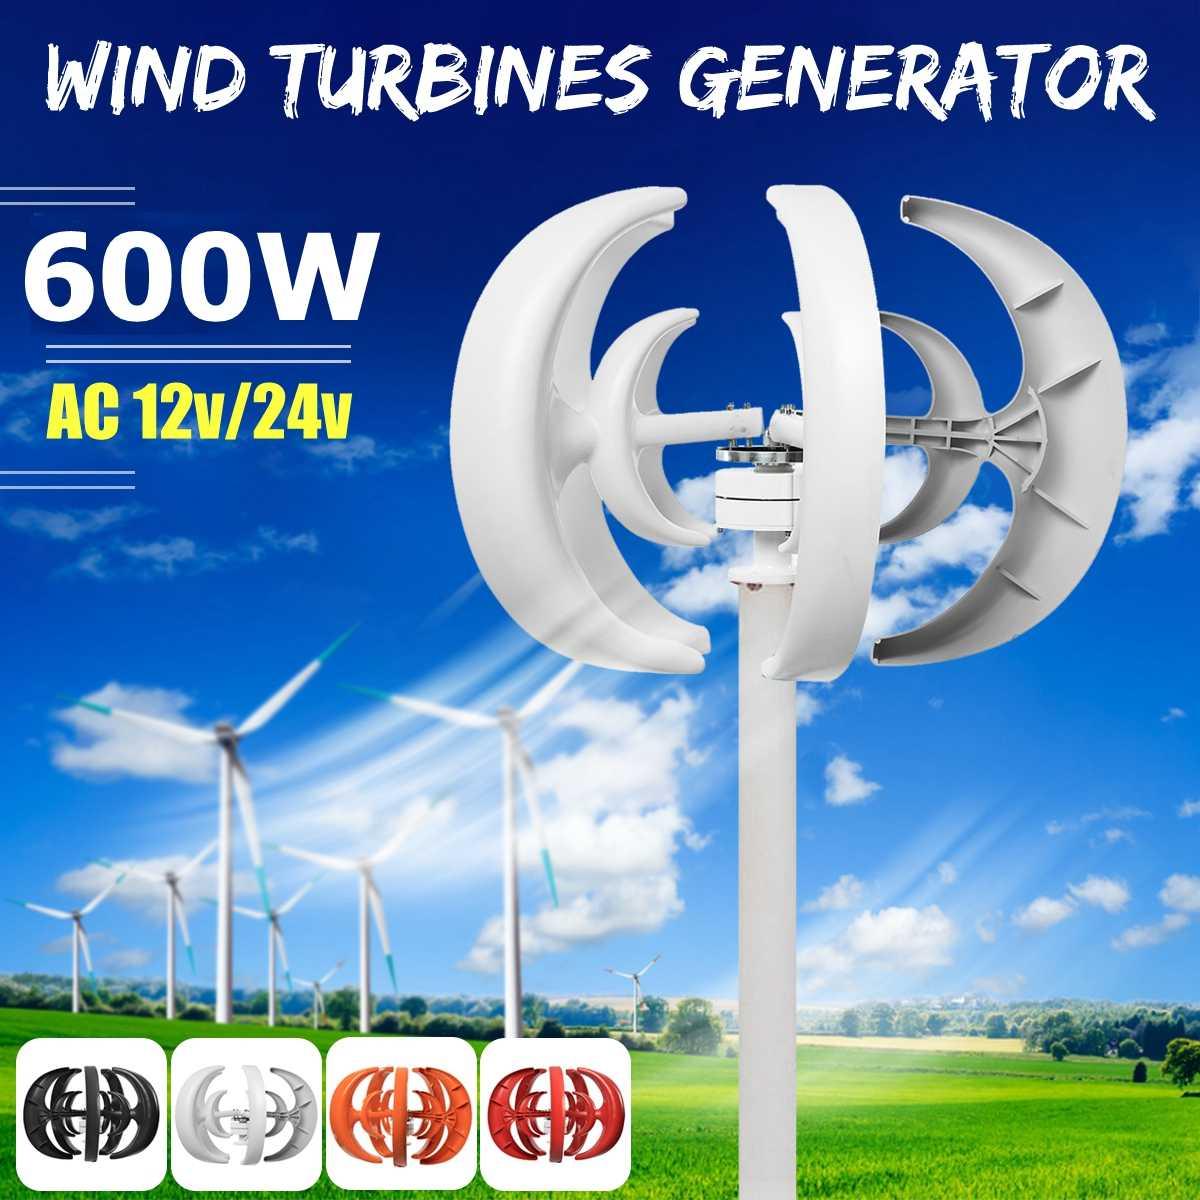 Max 600W AC 12V 24V Wind T urbine Generator Lantern 5 Blades Motor Kit Vertical Axis For Residential Household Streetlight Use